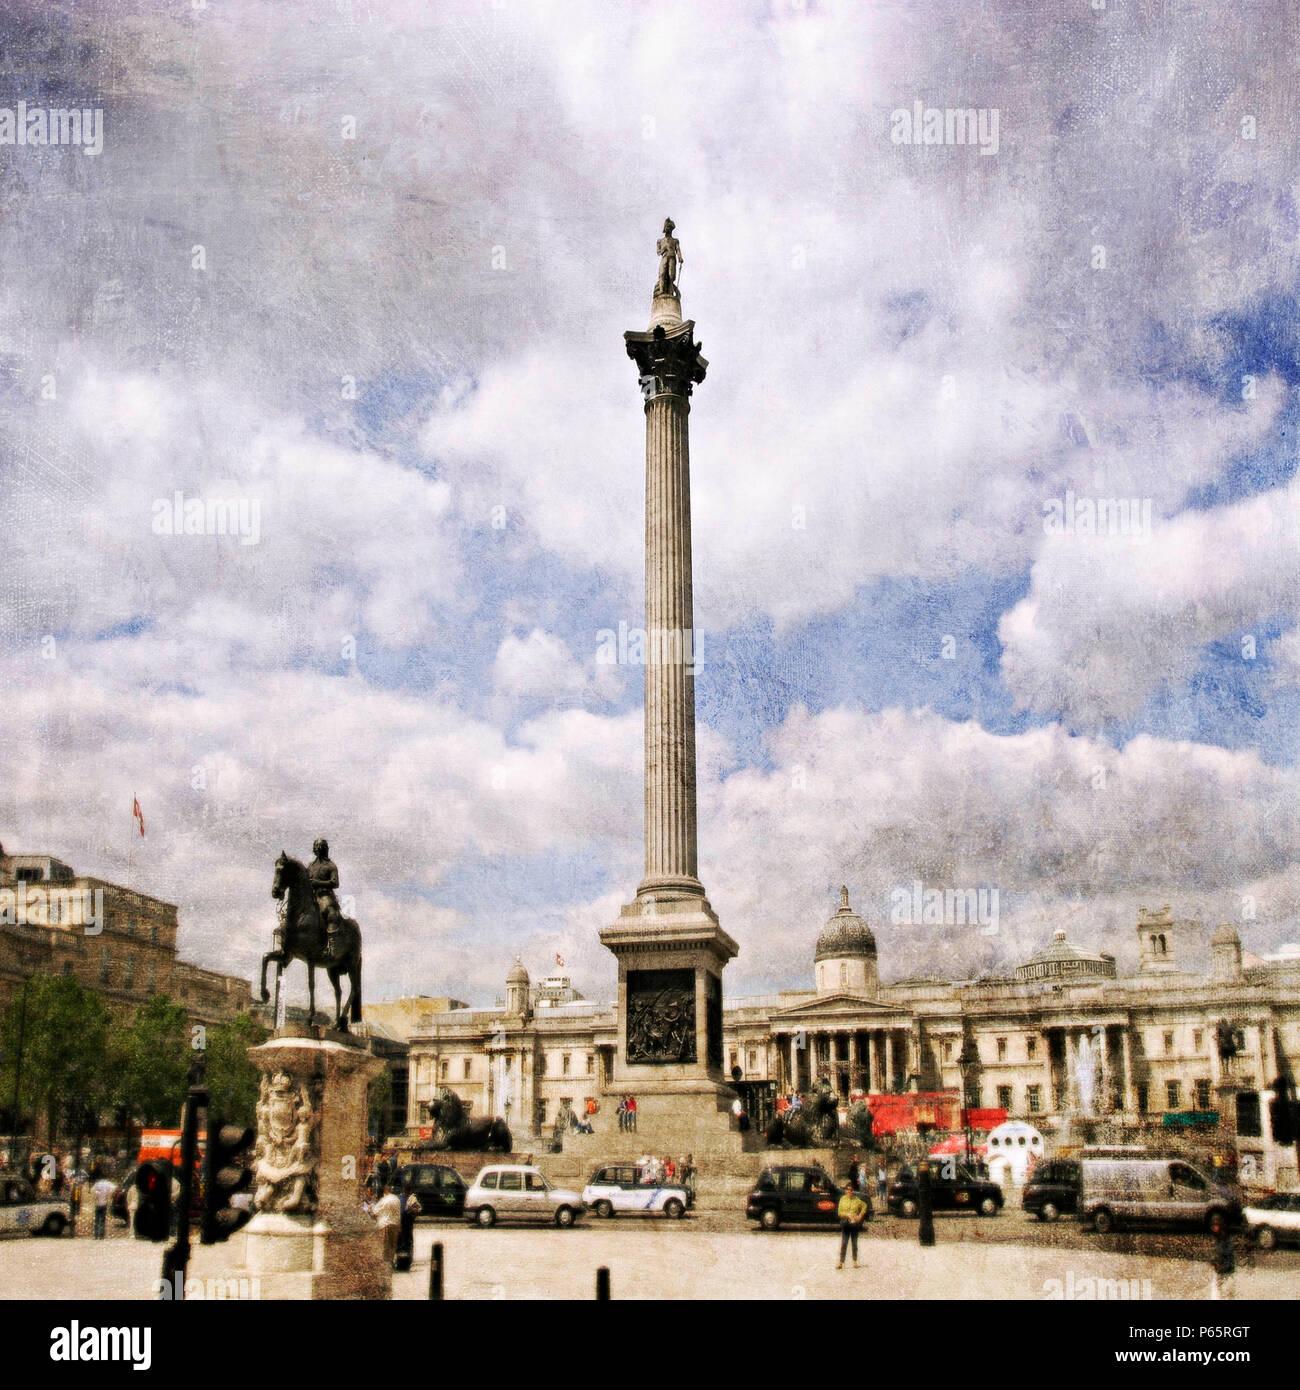 Trafalgar Square with Nelson Column, London, UK - Stock Image